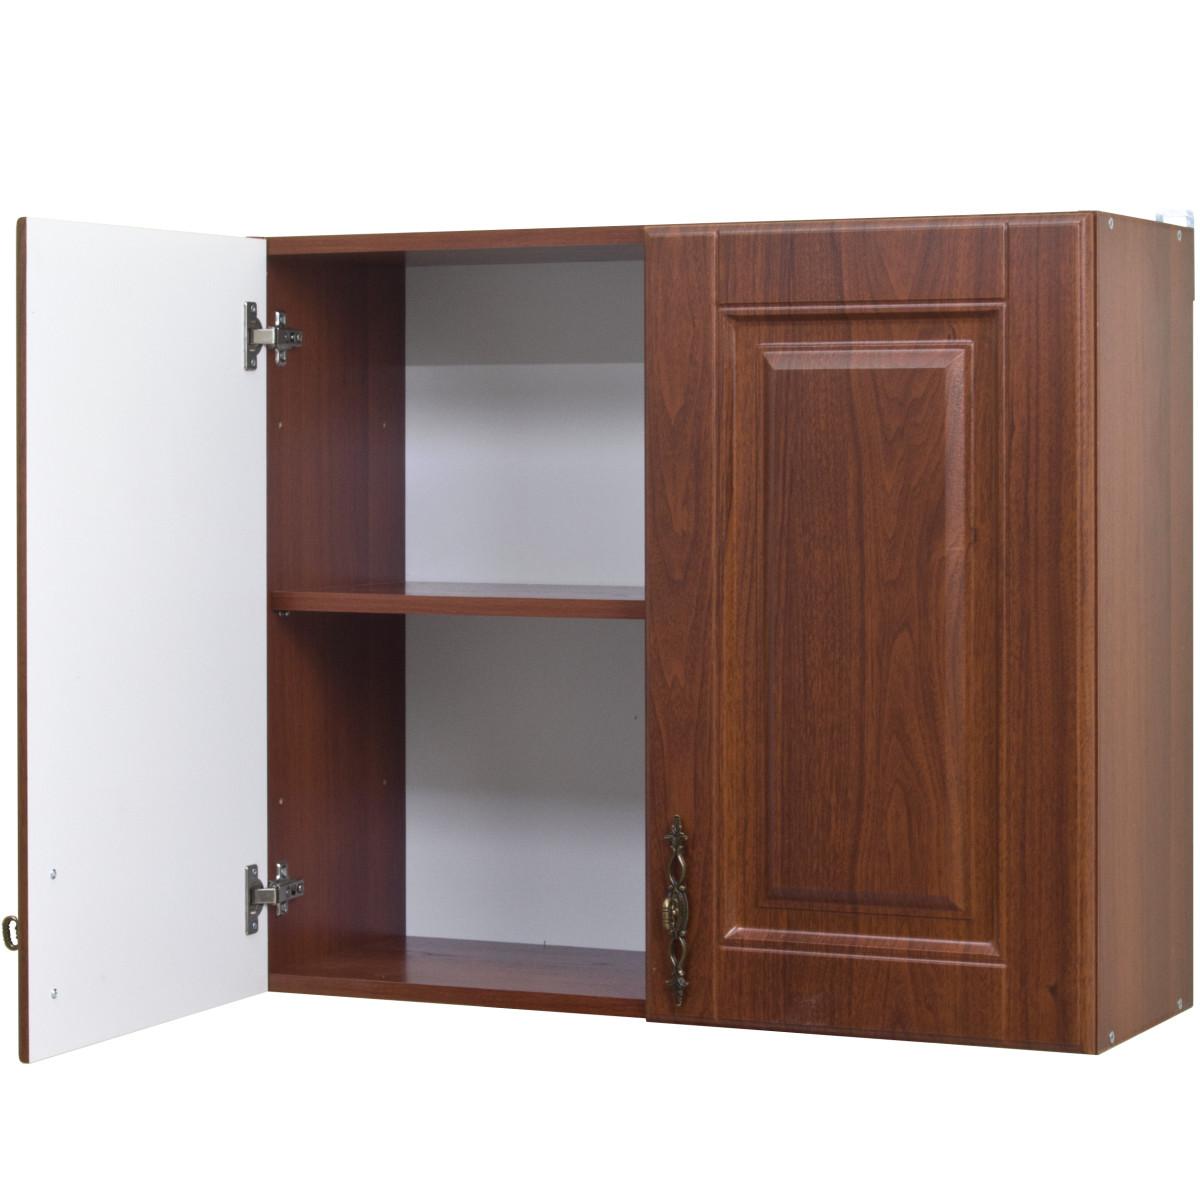 Шкаф навесной Орех 80х676х29 см цвет темный орех